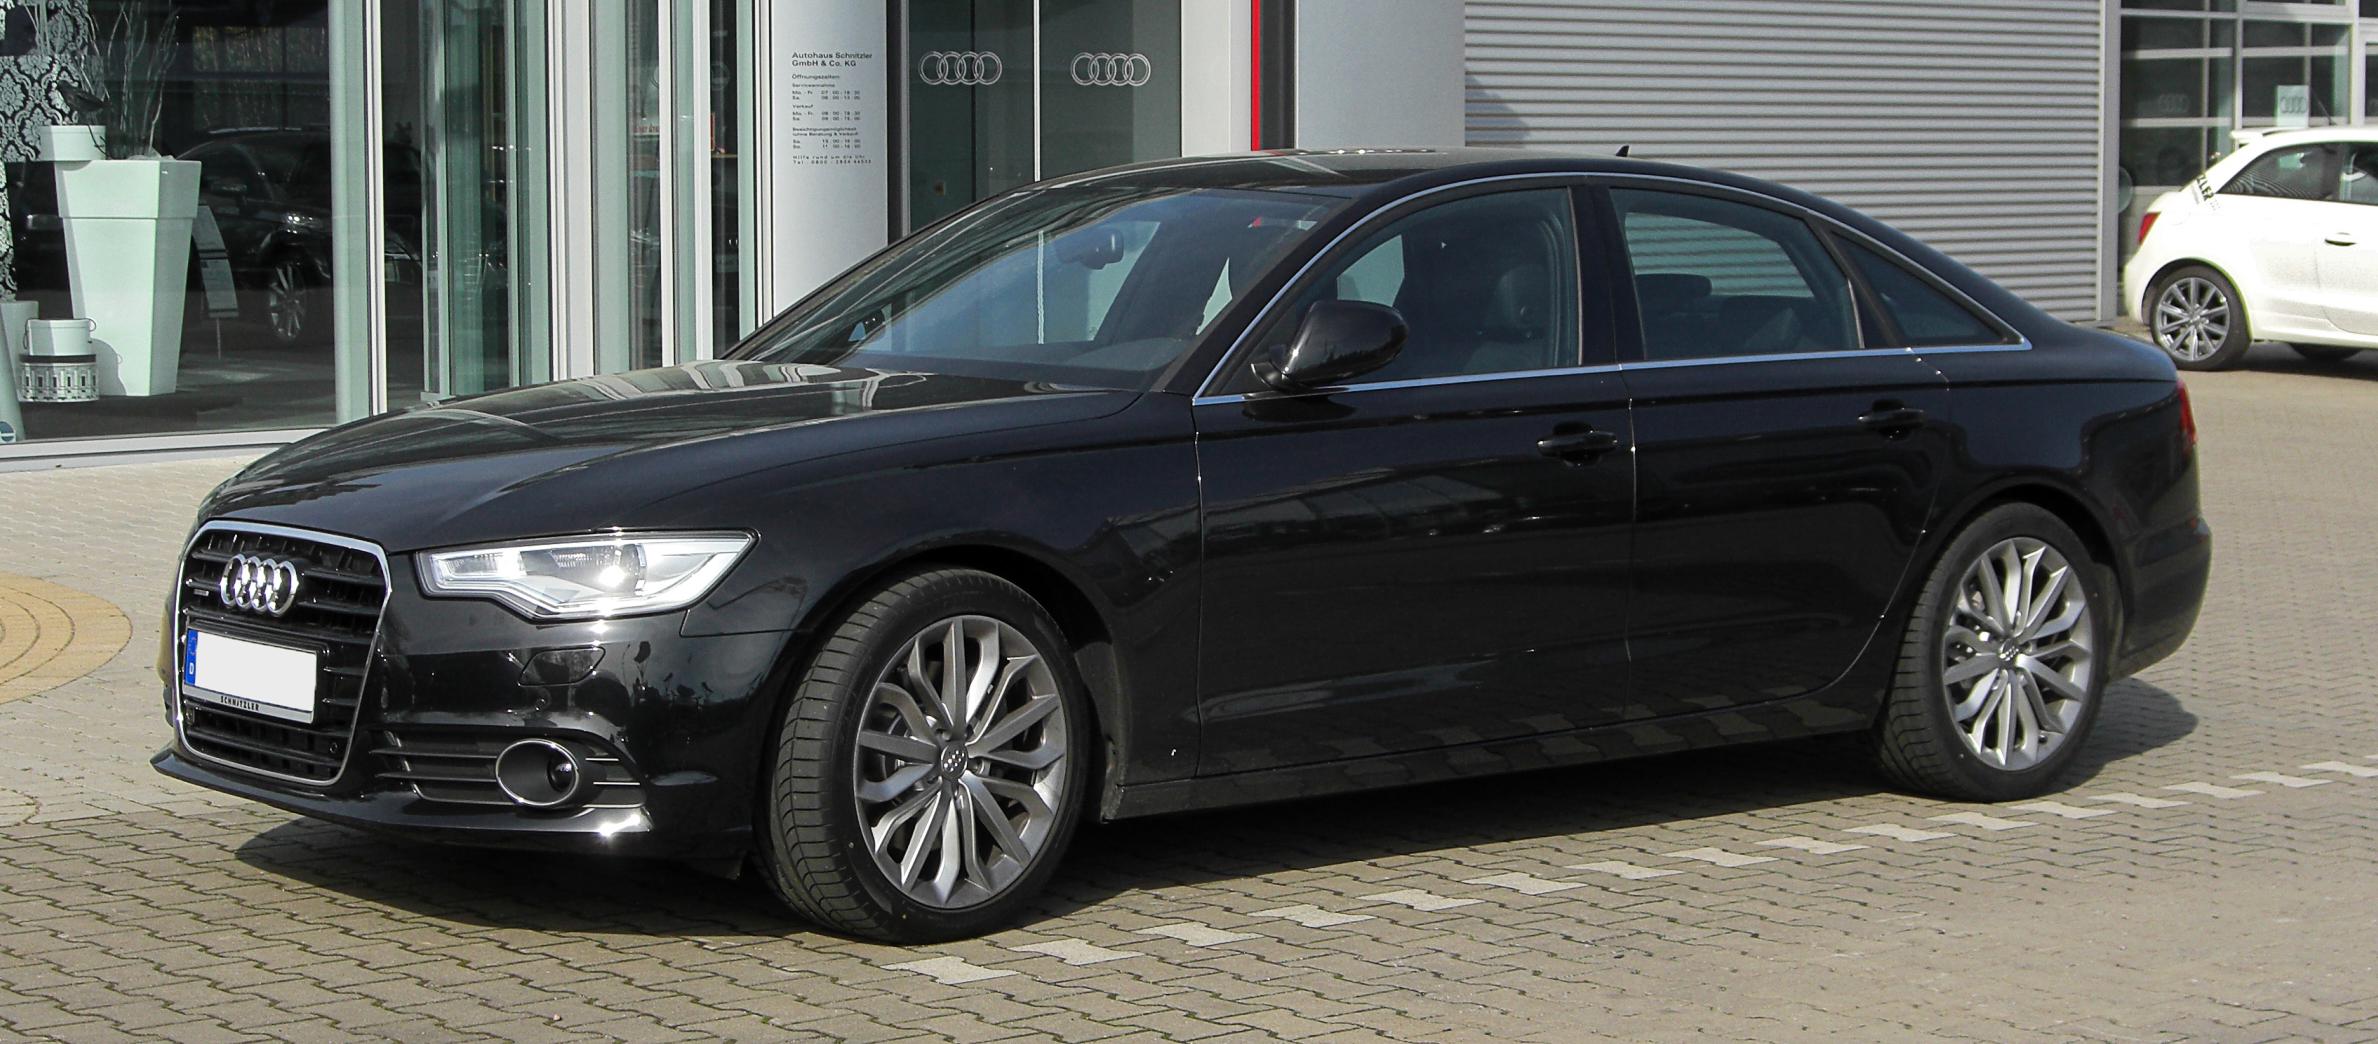 Audi a6 wikiwand sciox Choice Image